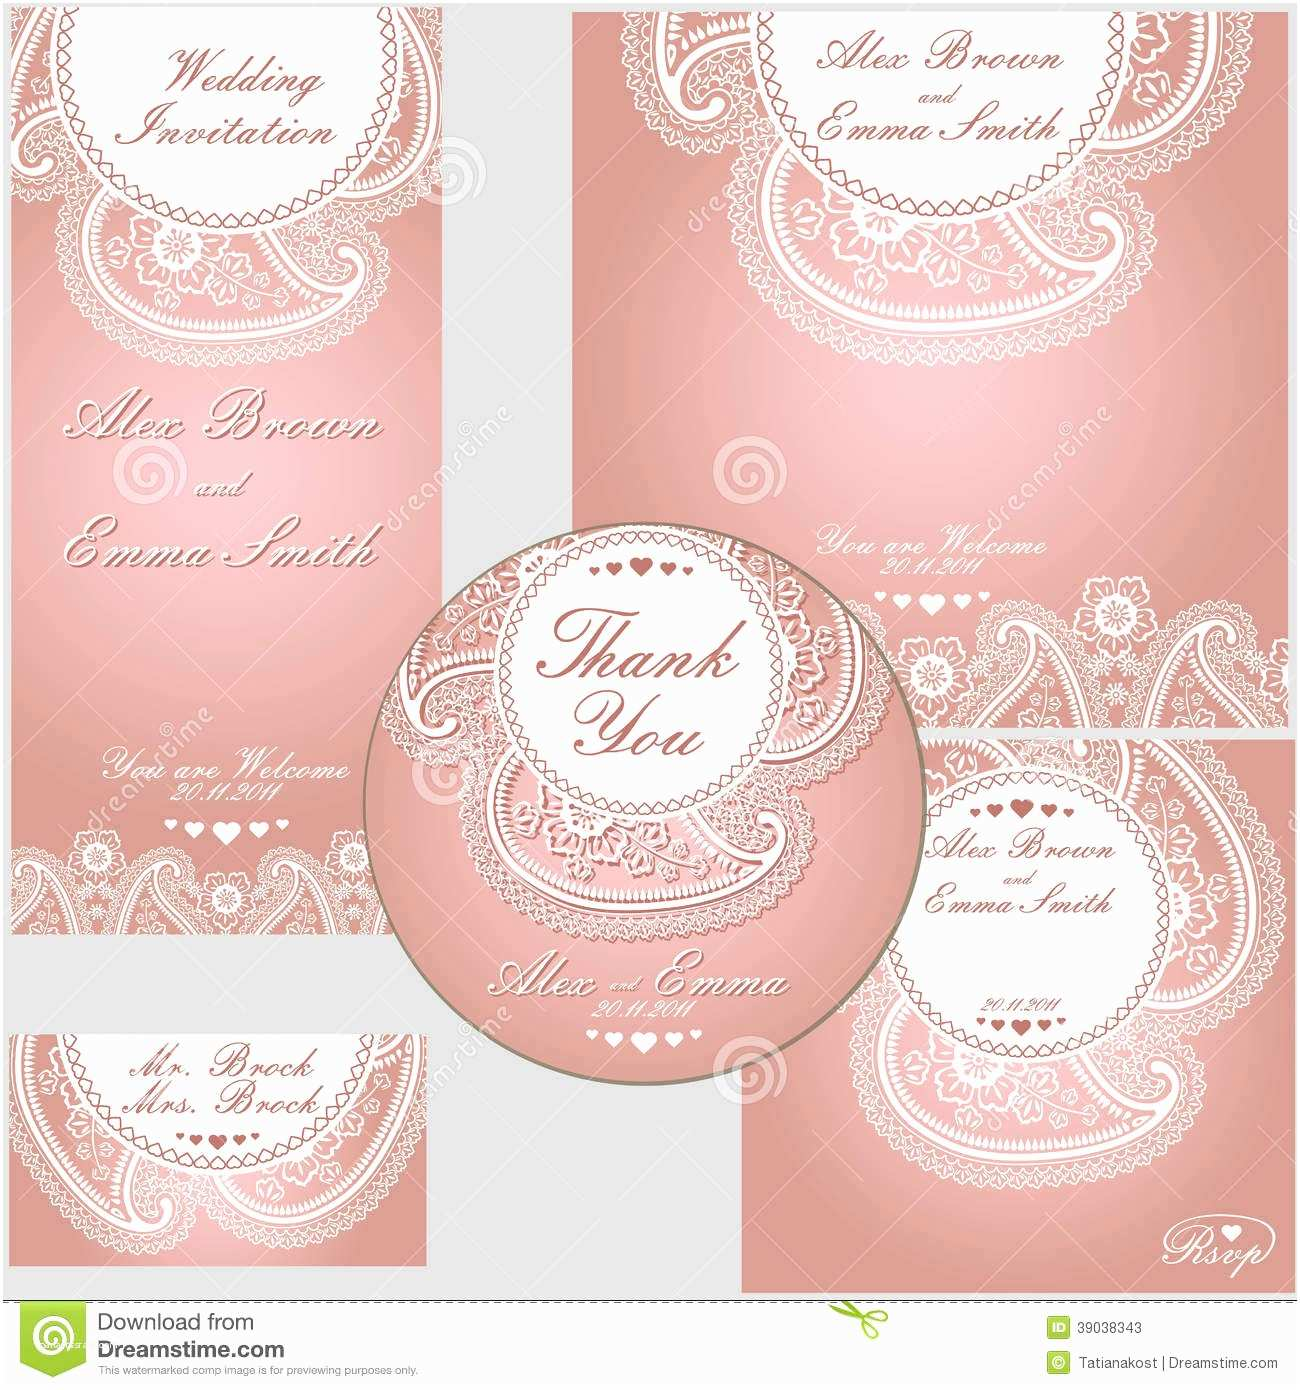 Paisley Wedding Invitation Template Paisley Border Lace Design Template Stock Vector Image